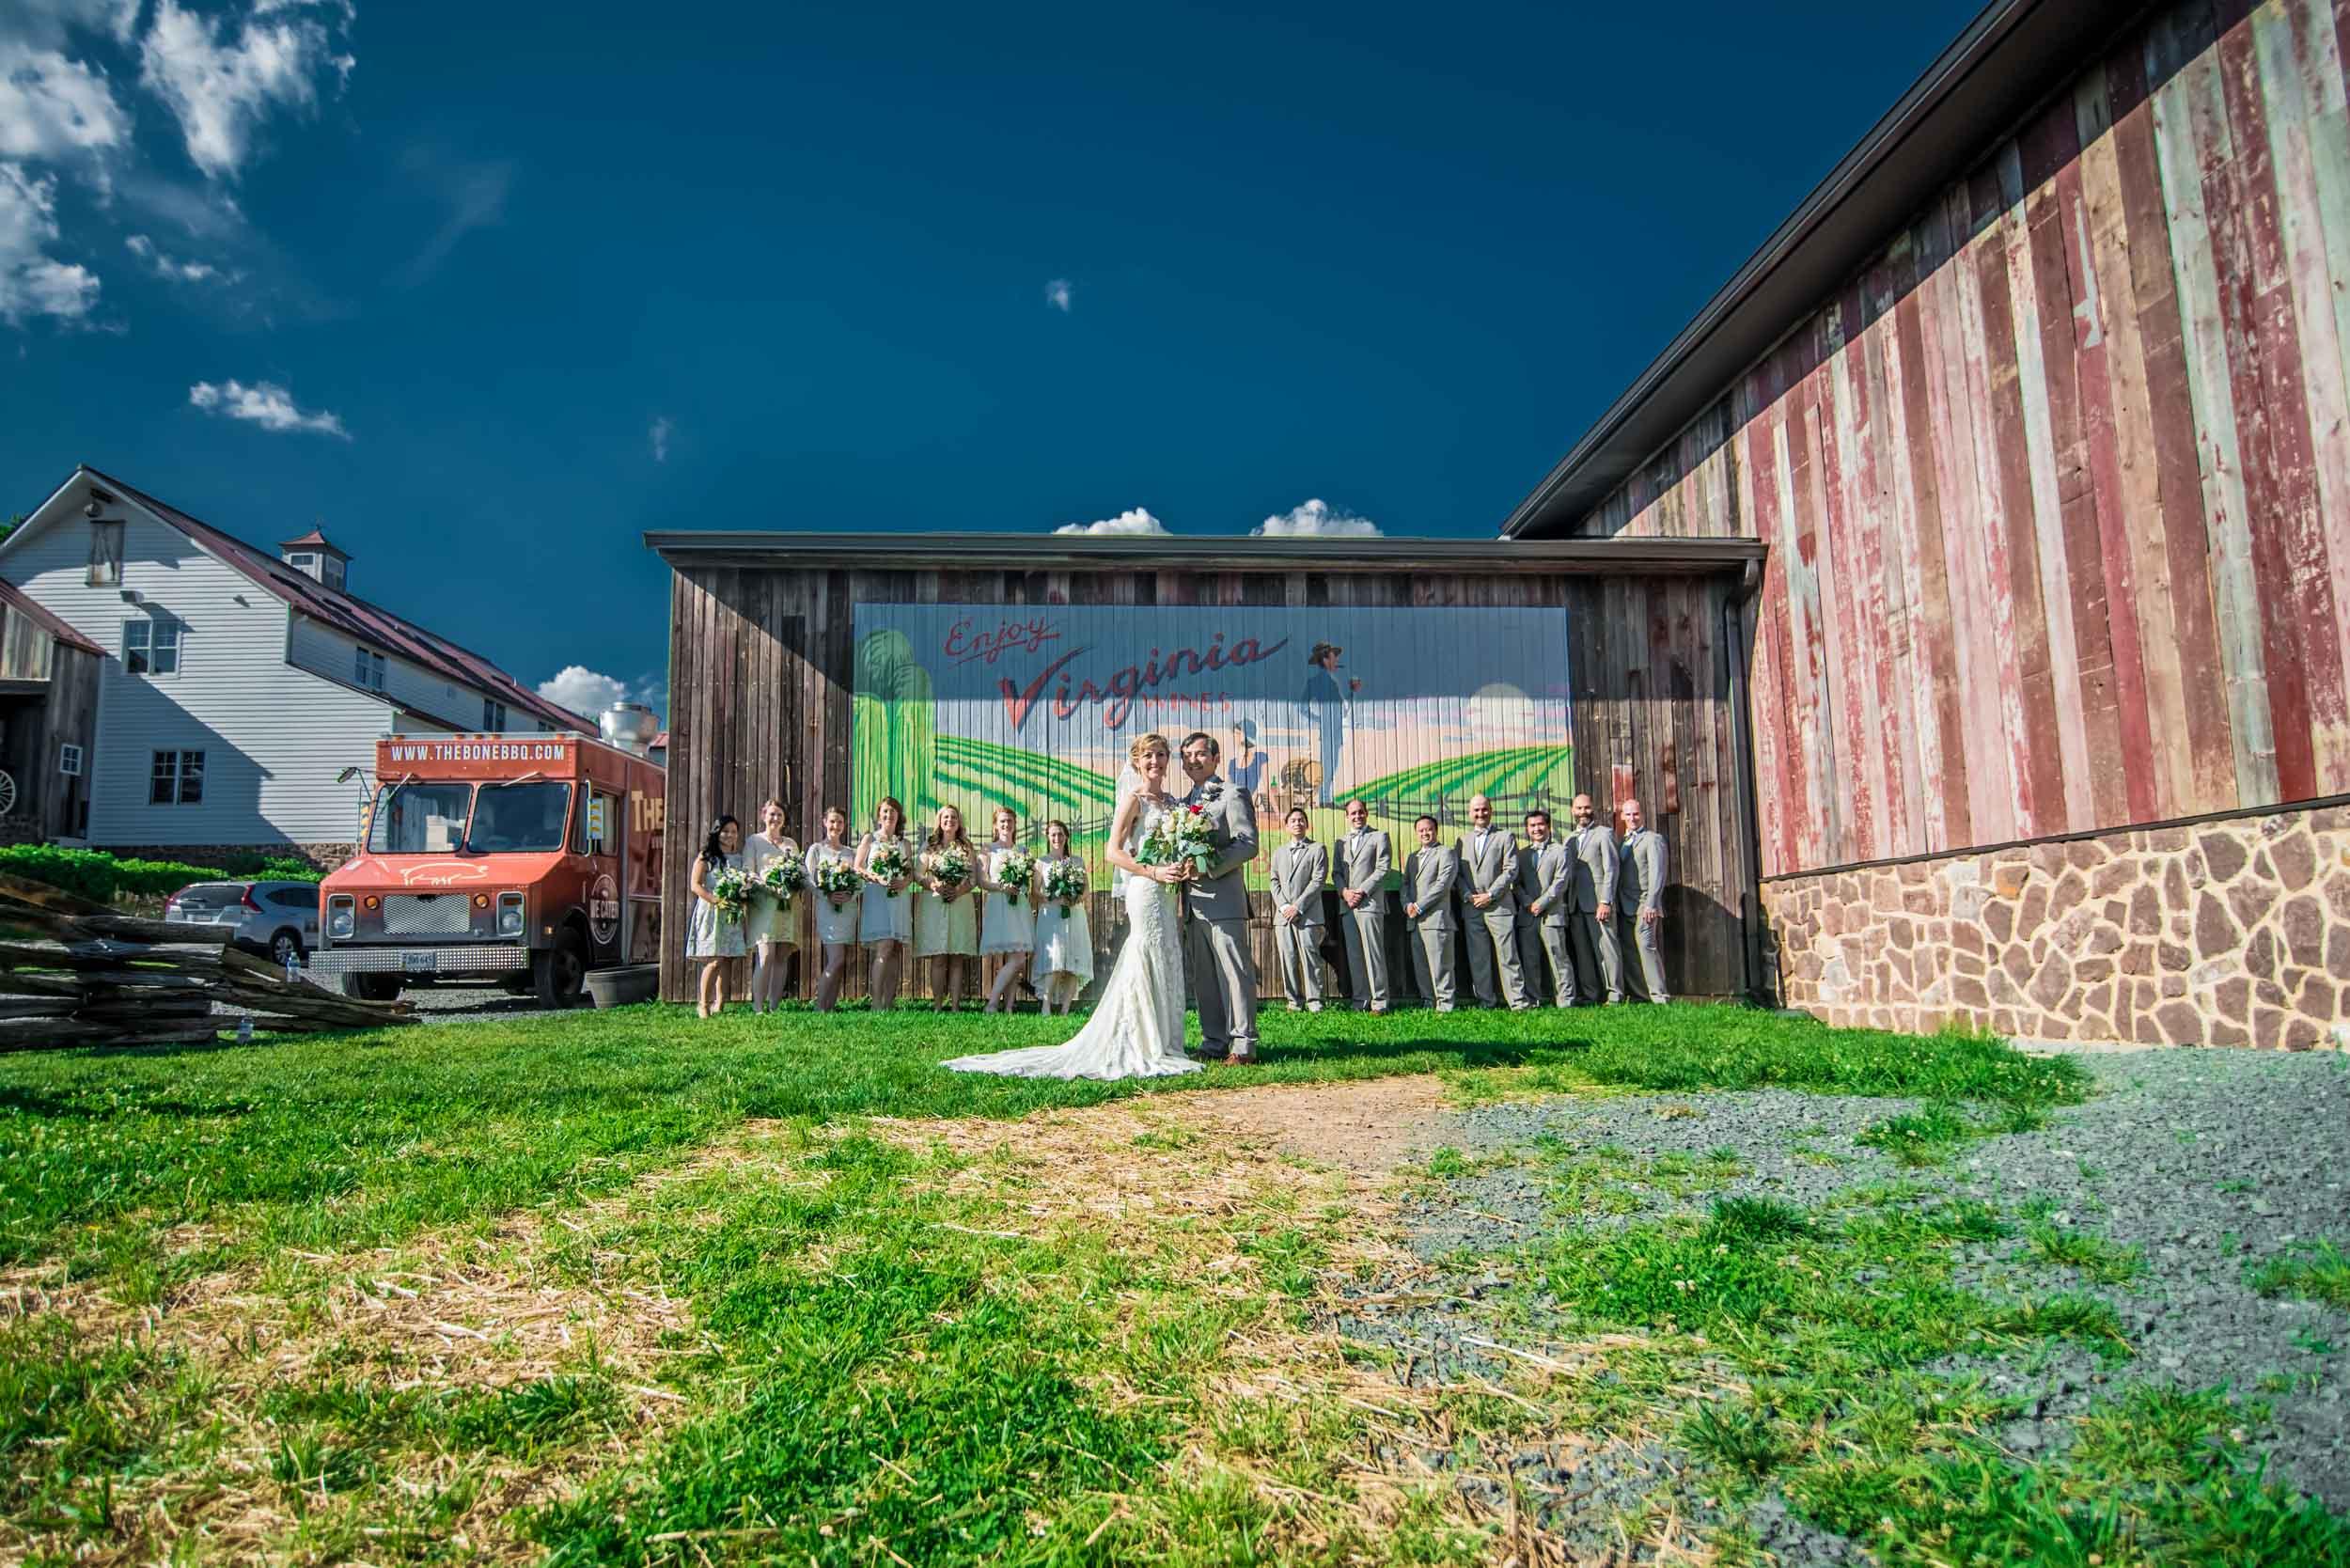 dc+metro+wedding+photographer+vadym+guliuk+photography+wedding+party-2024.jpg